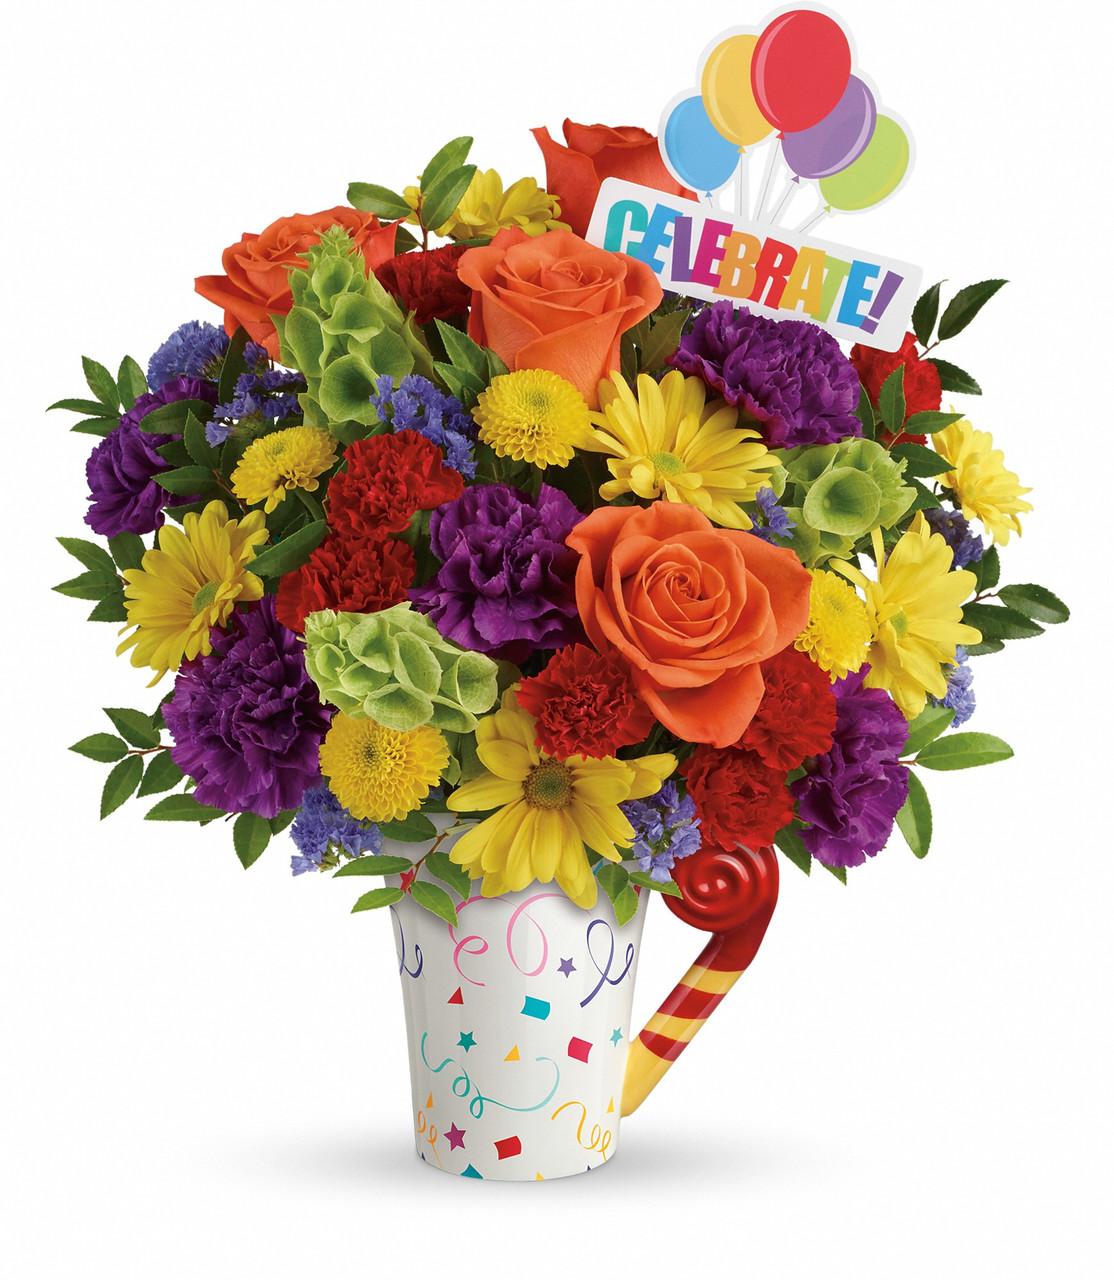 Happy Birthday Flower Bouquet La Porte Tx Florist Delivery